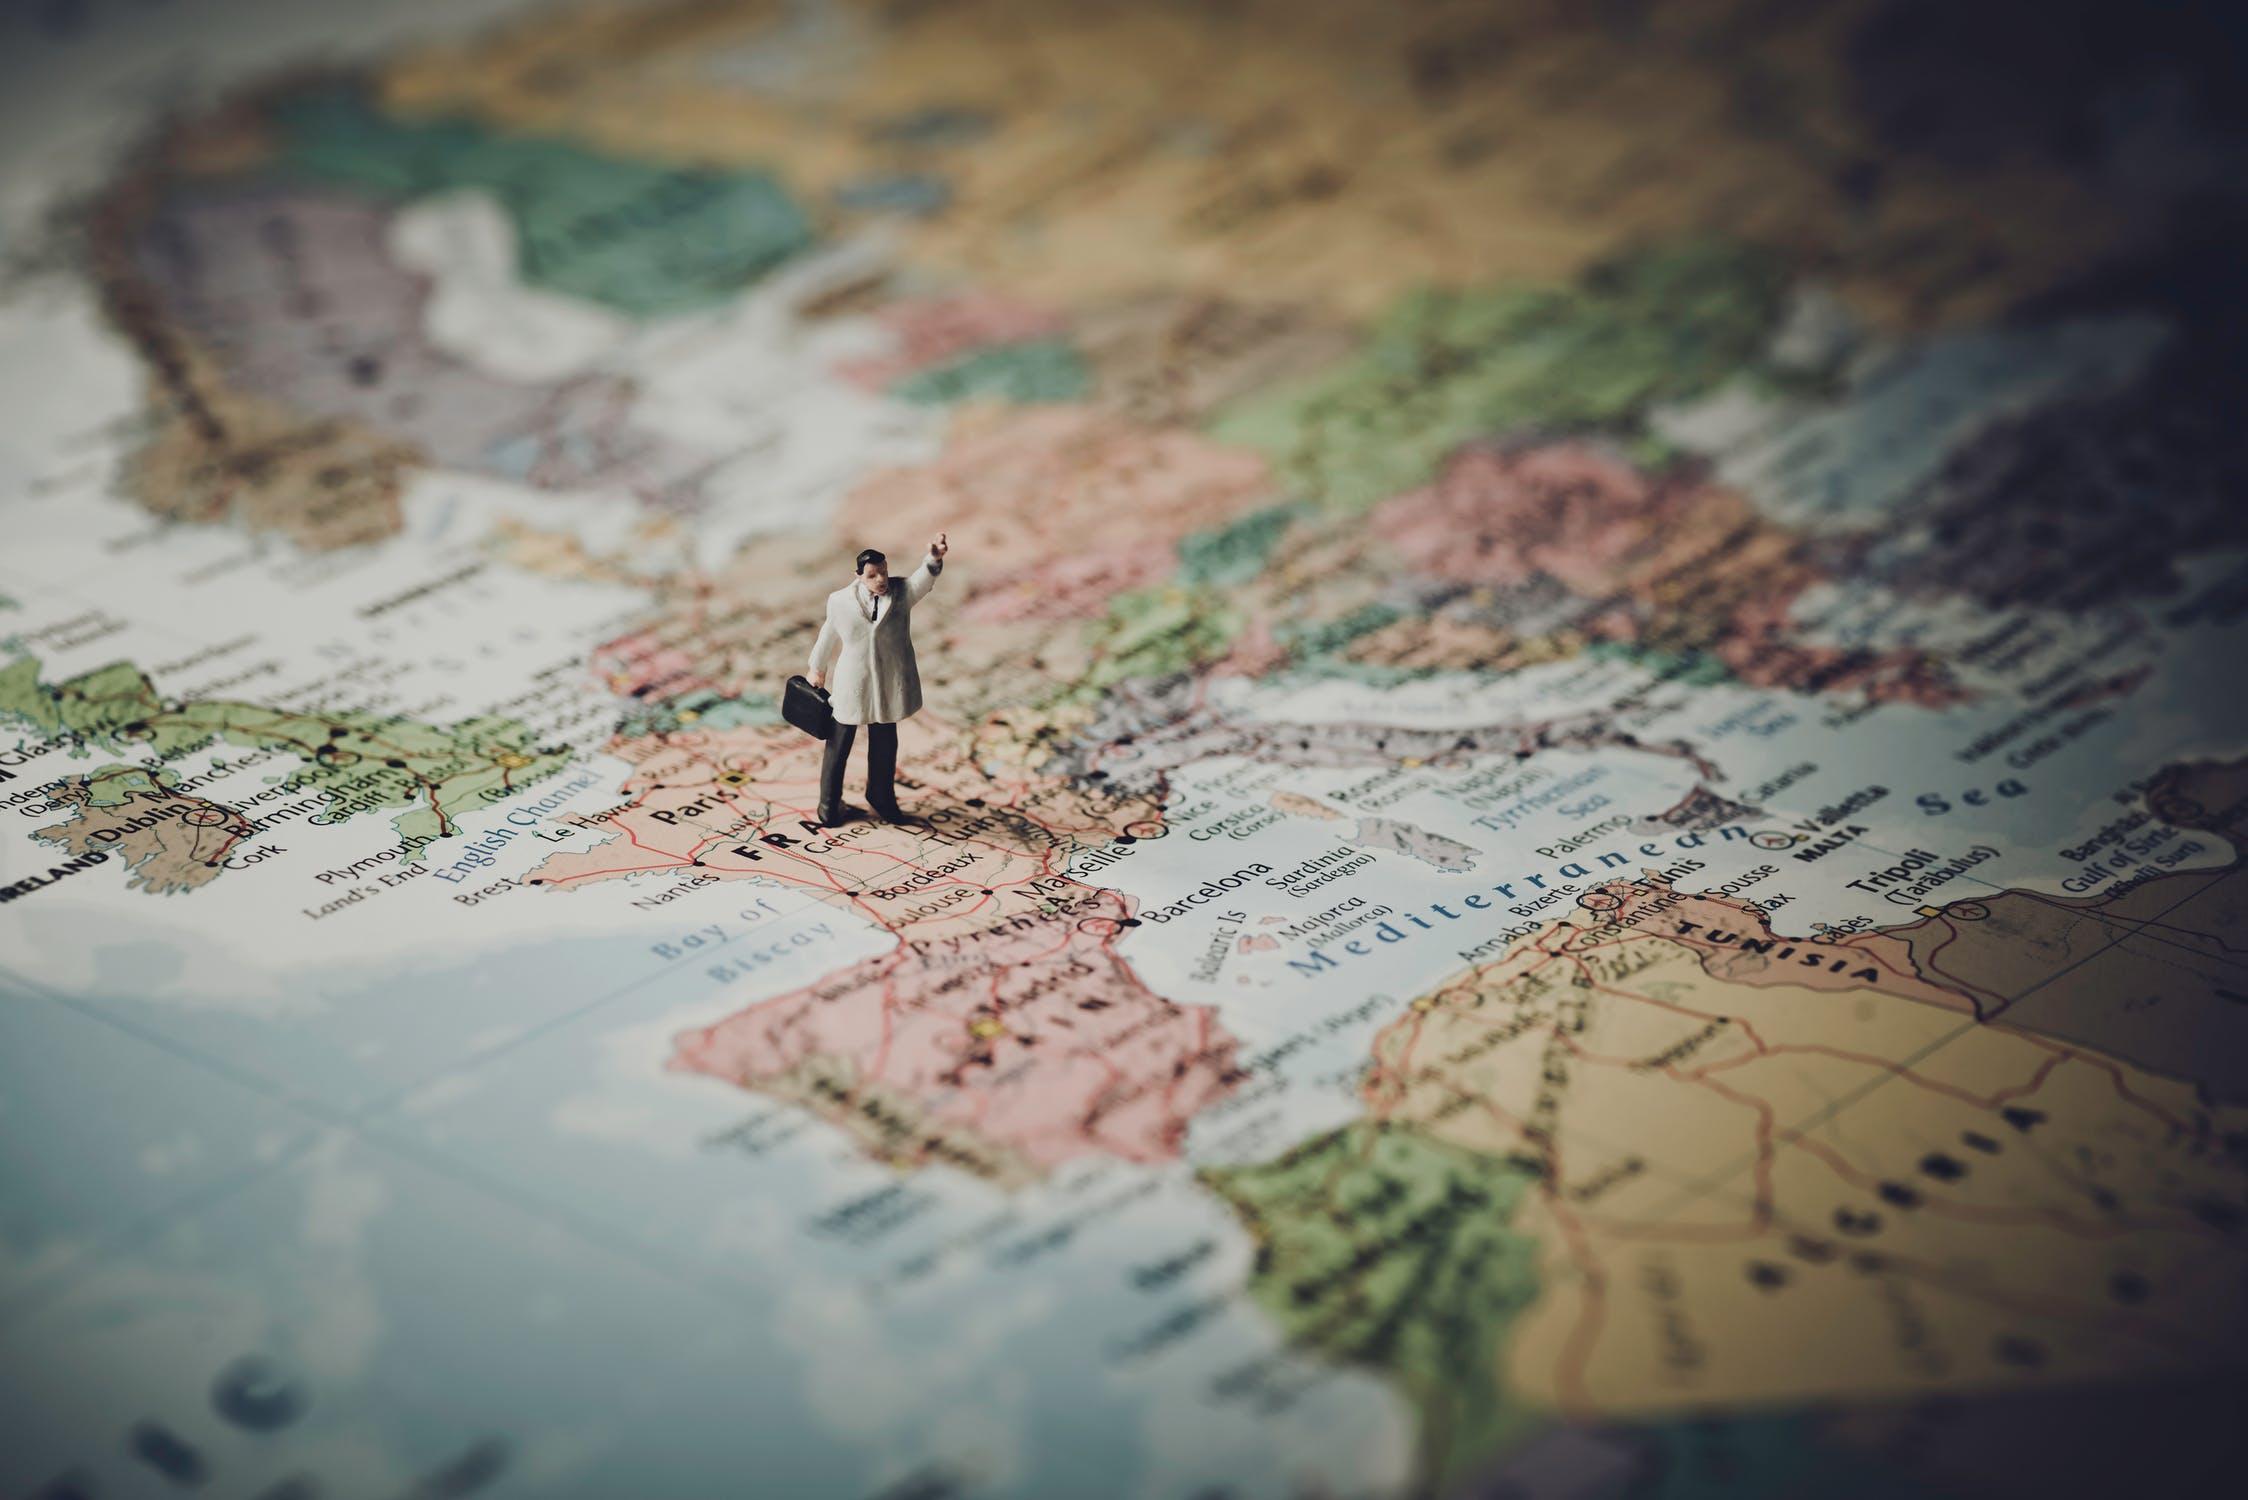 requisitos entrada territorio español por extranjero